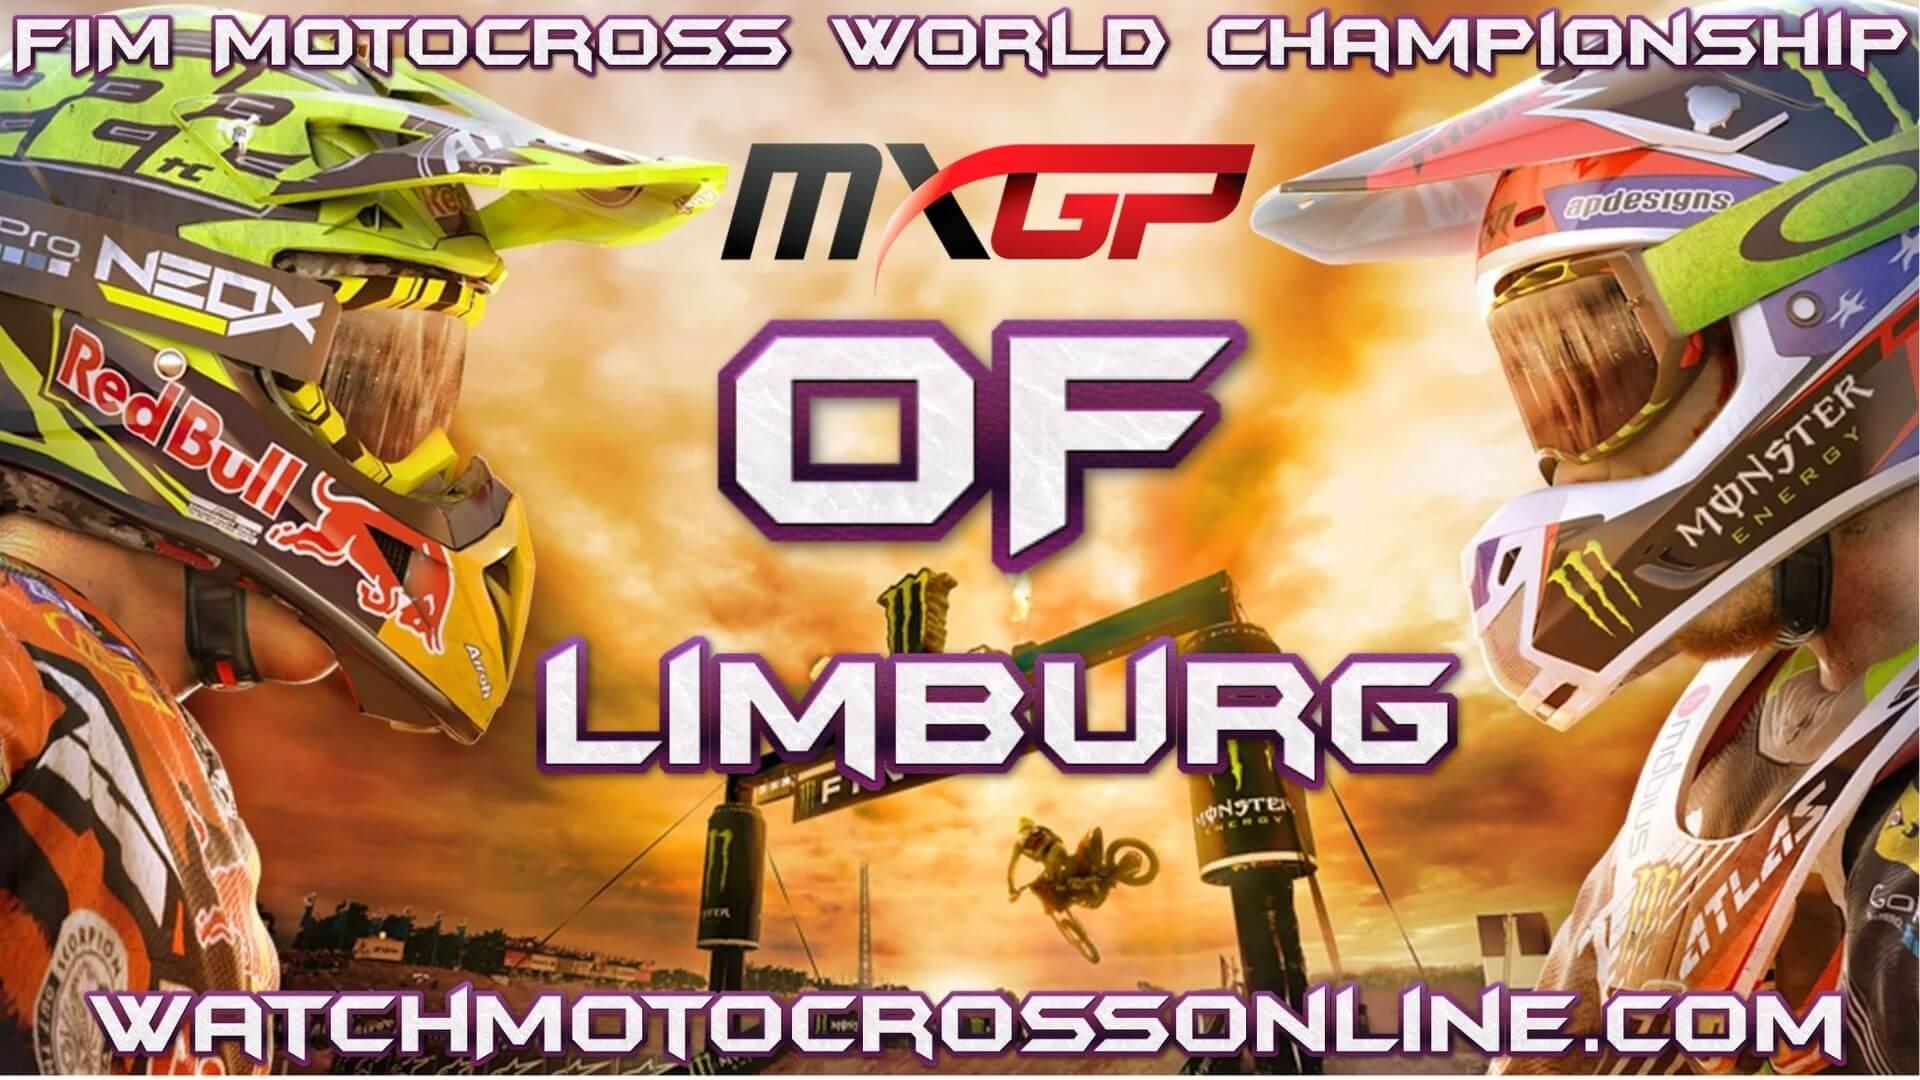 MXGP Of Limburg Live Stream 2020